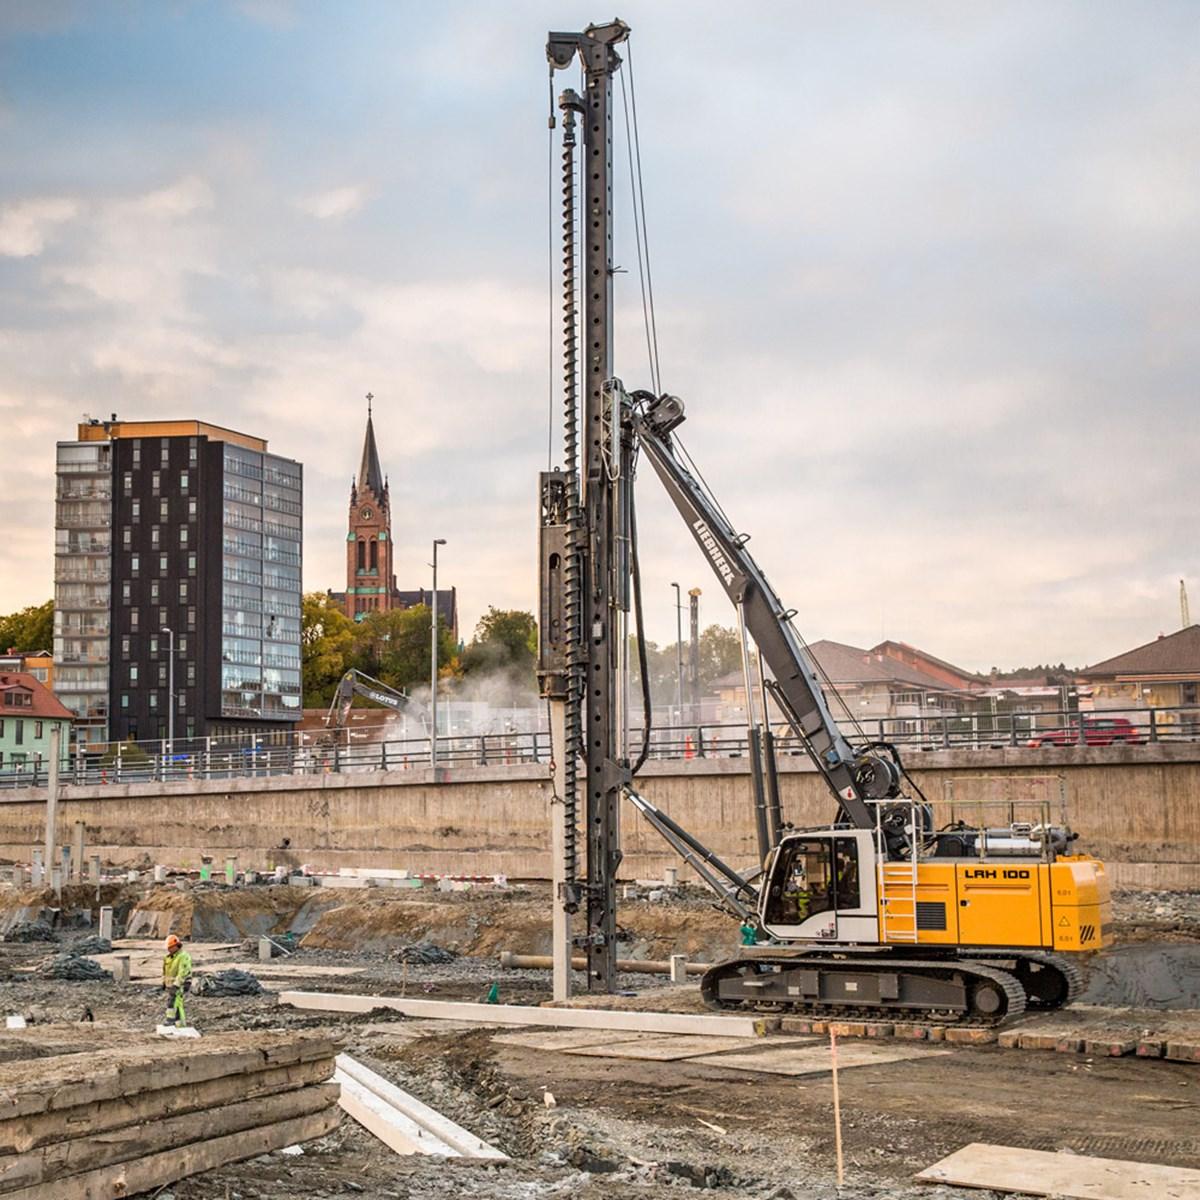 liebherr-lrh-100-piling-rig-cast-in-place-concrete-piles-hydraulic-hammer.jpg